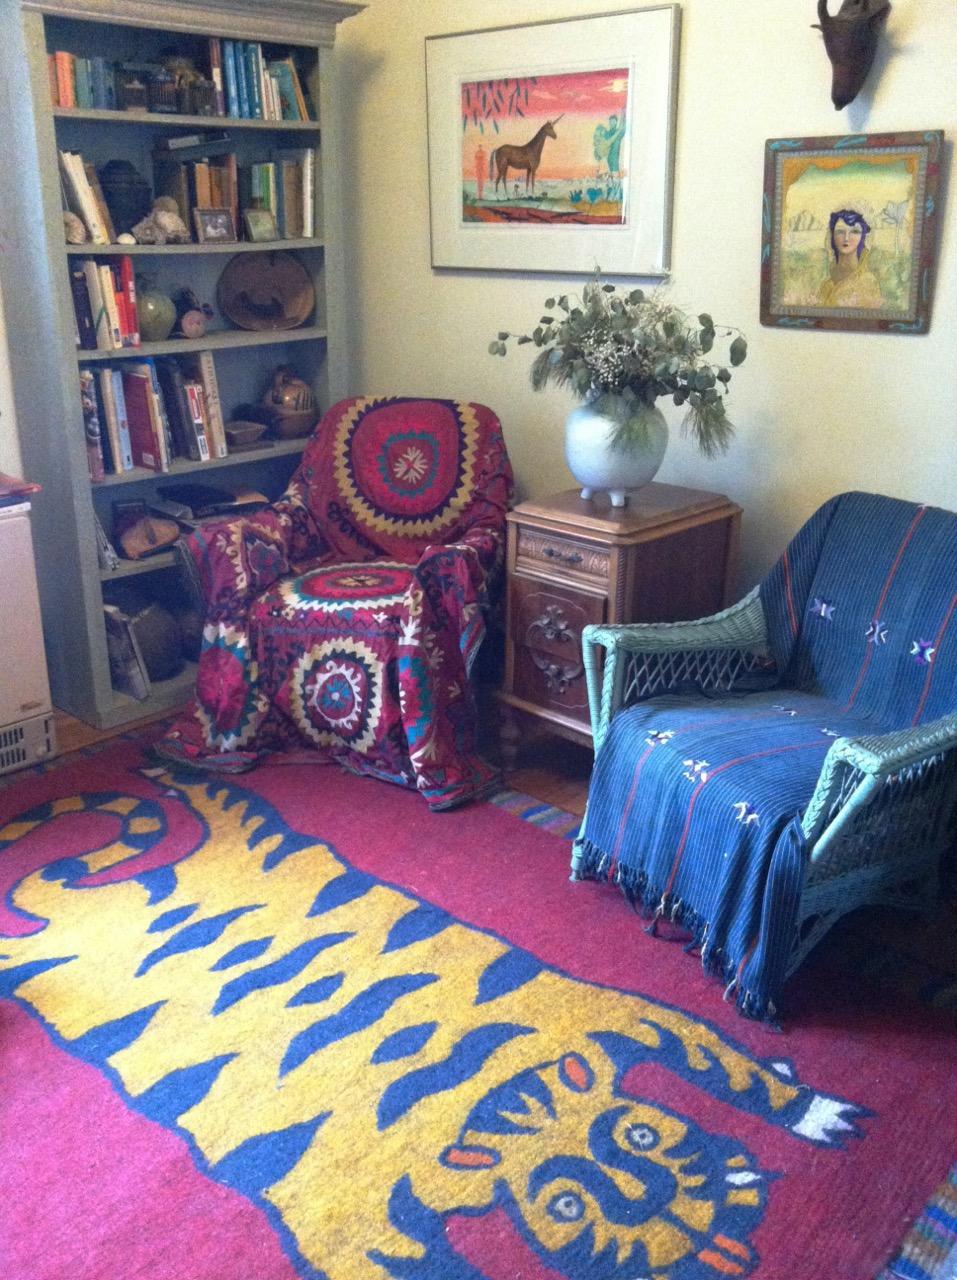 tiger-rug-in-reading-room.jpeg